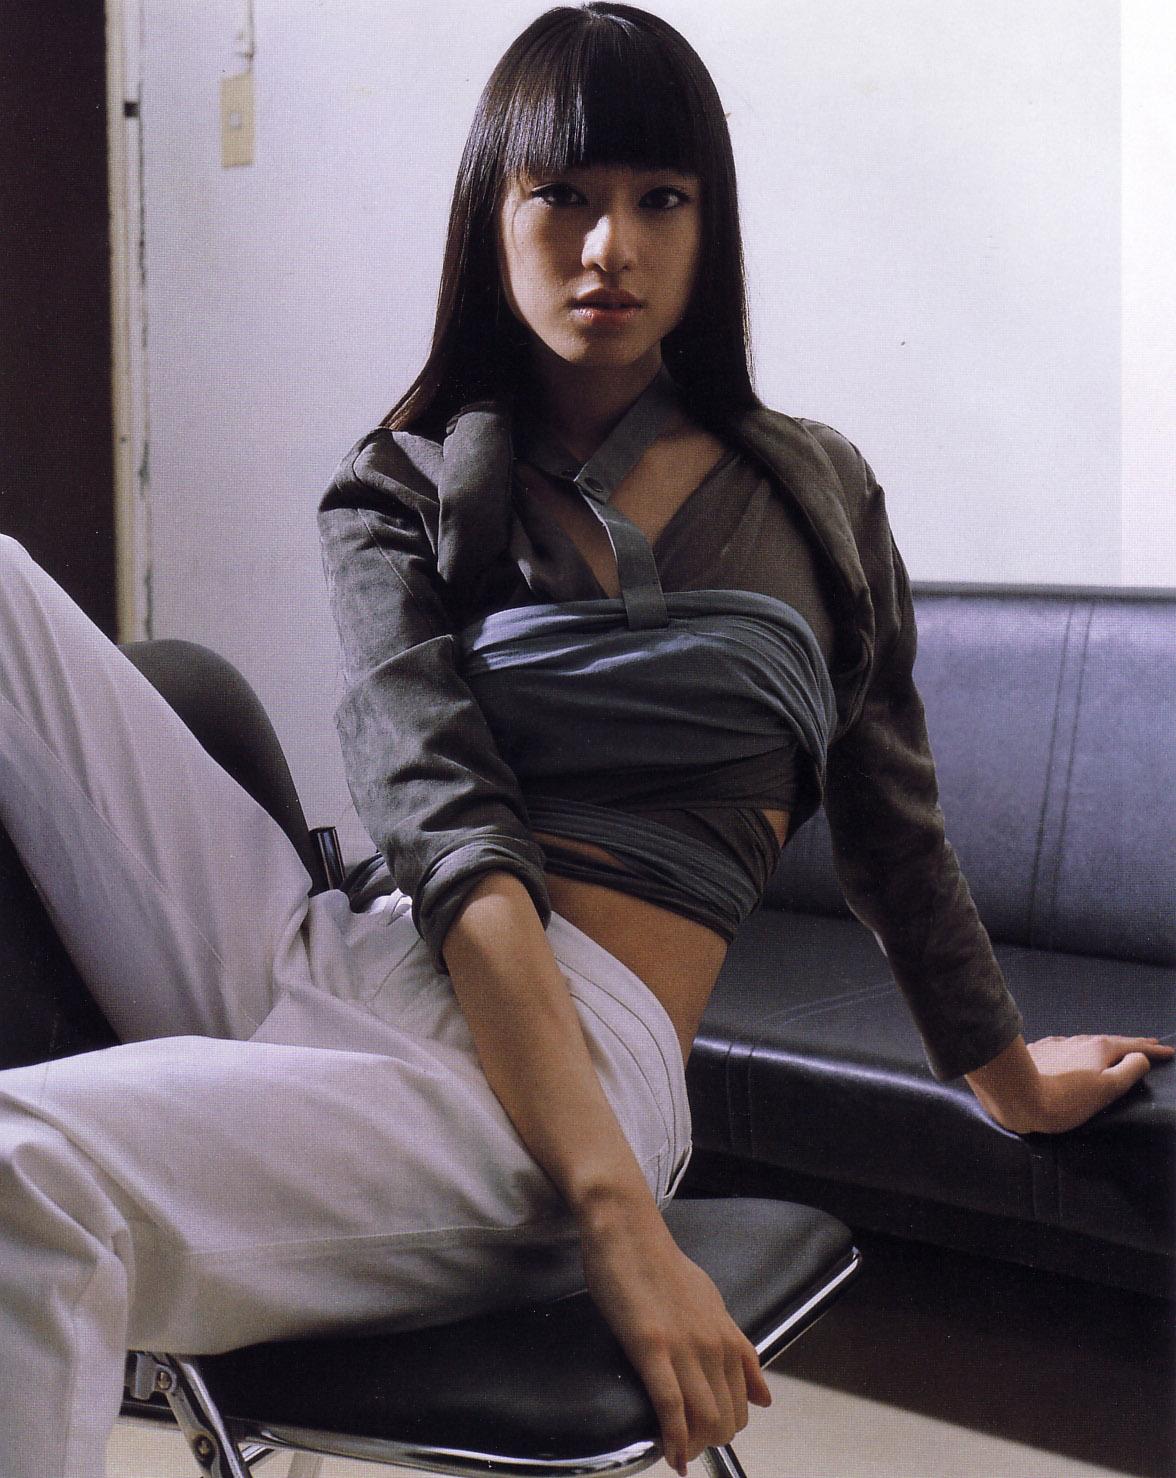 http://4.bp.blogspot.com/-WSnPSUmeMnY/T_GegkTSzTI/AAAAAAAApzM/8VkEwpAoCMs/s1600/chiaki-kuriyama-104.jpg